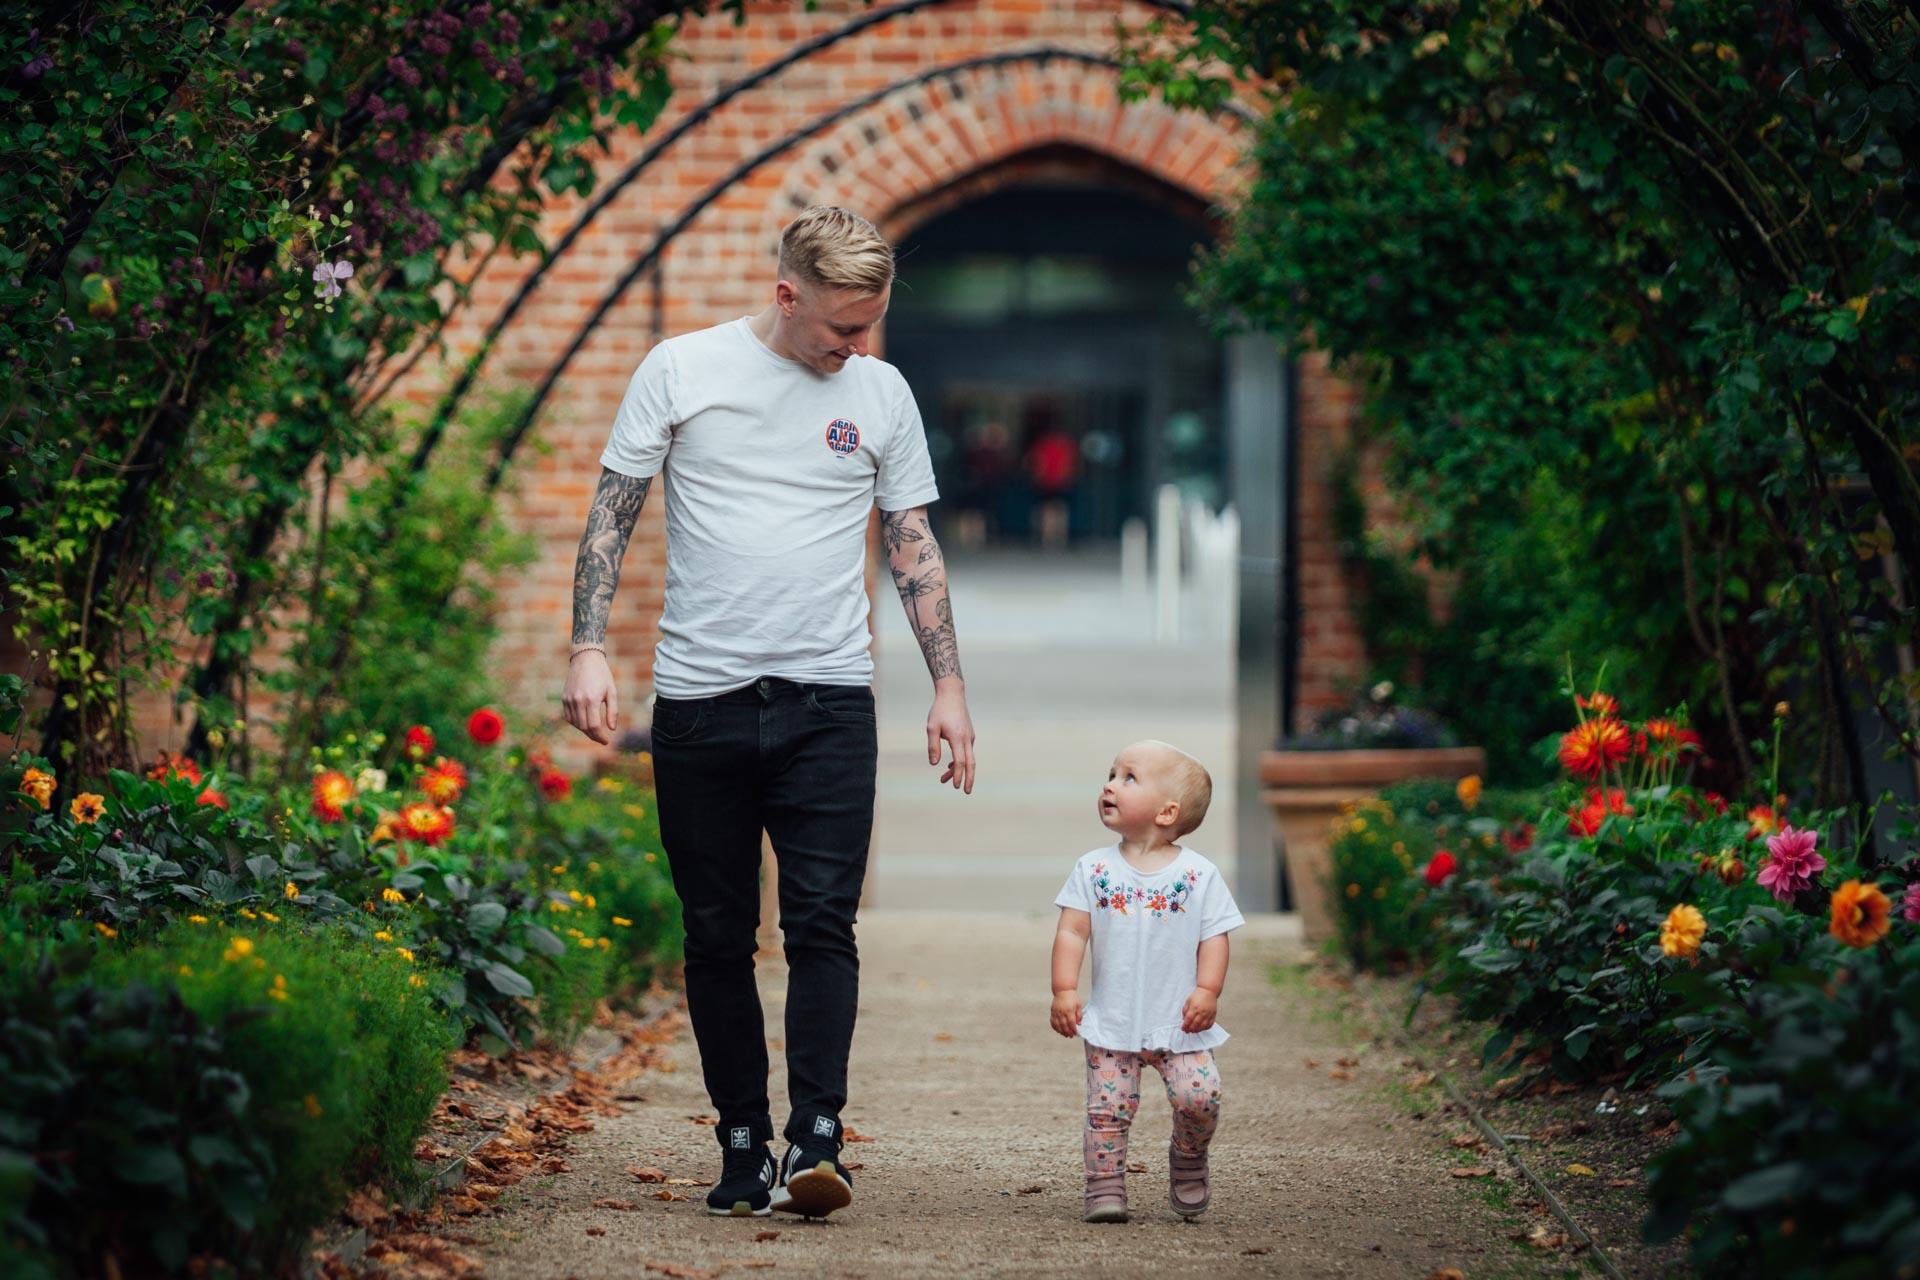 Children Family Photography by Ricky Parker Photography 5